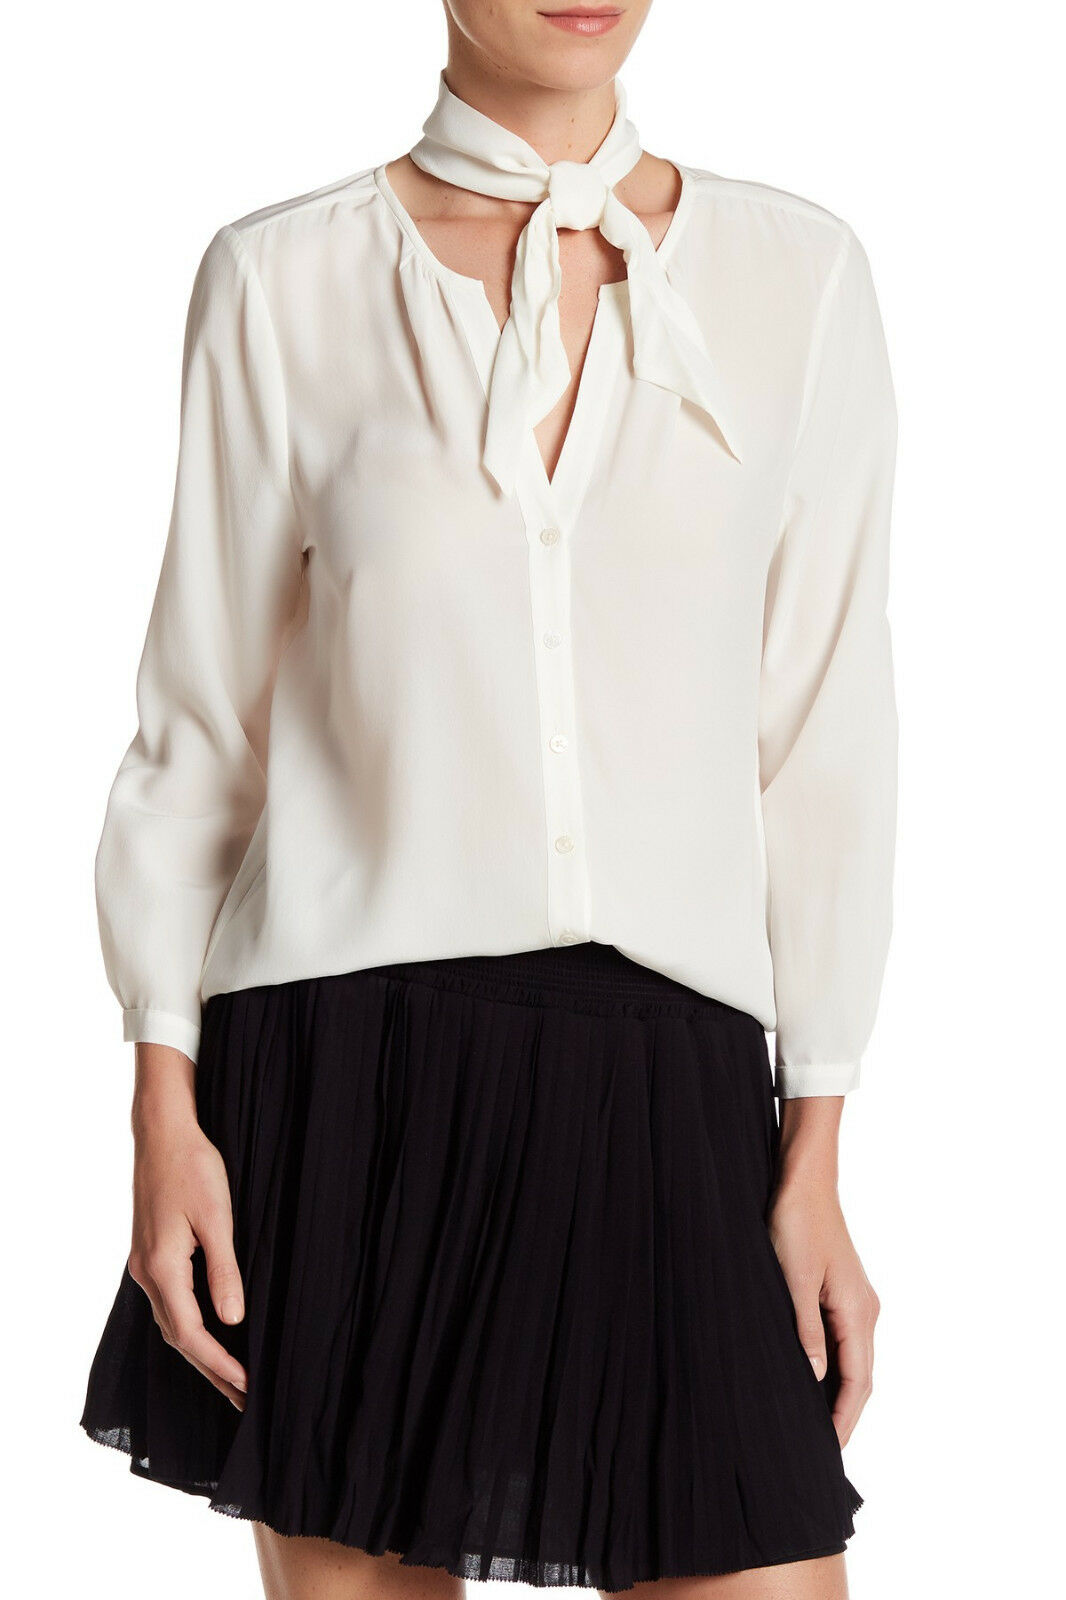 Joie Nile 100% Silk Tie Neck Detail Blouse Farbe PORCELAIN Größe L NEW